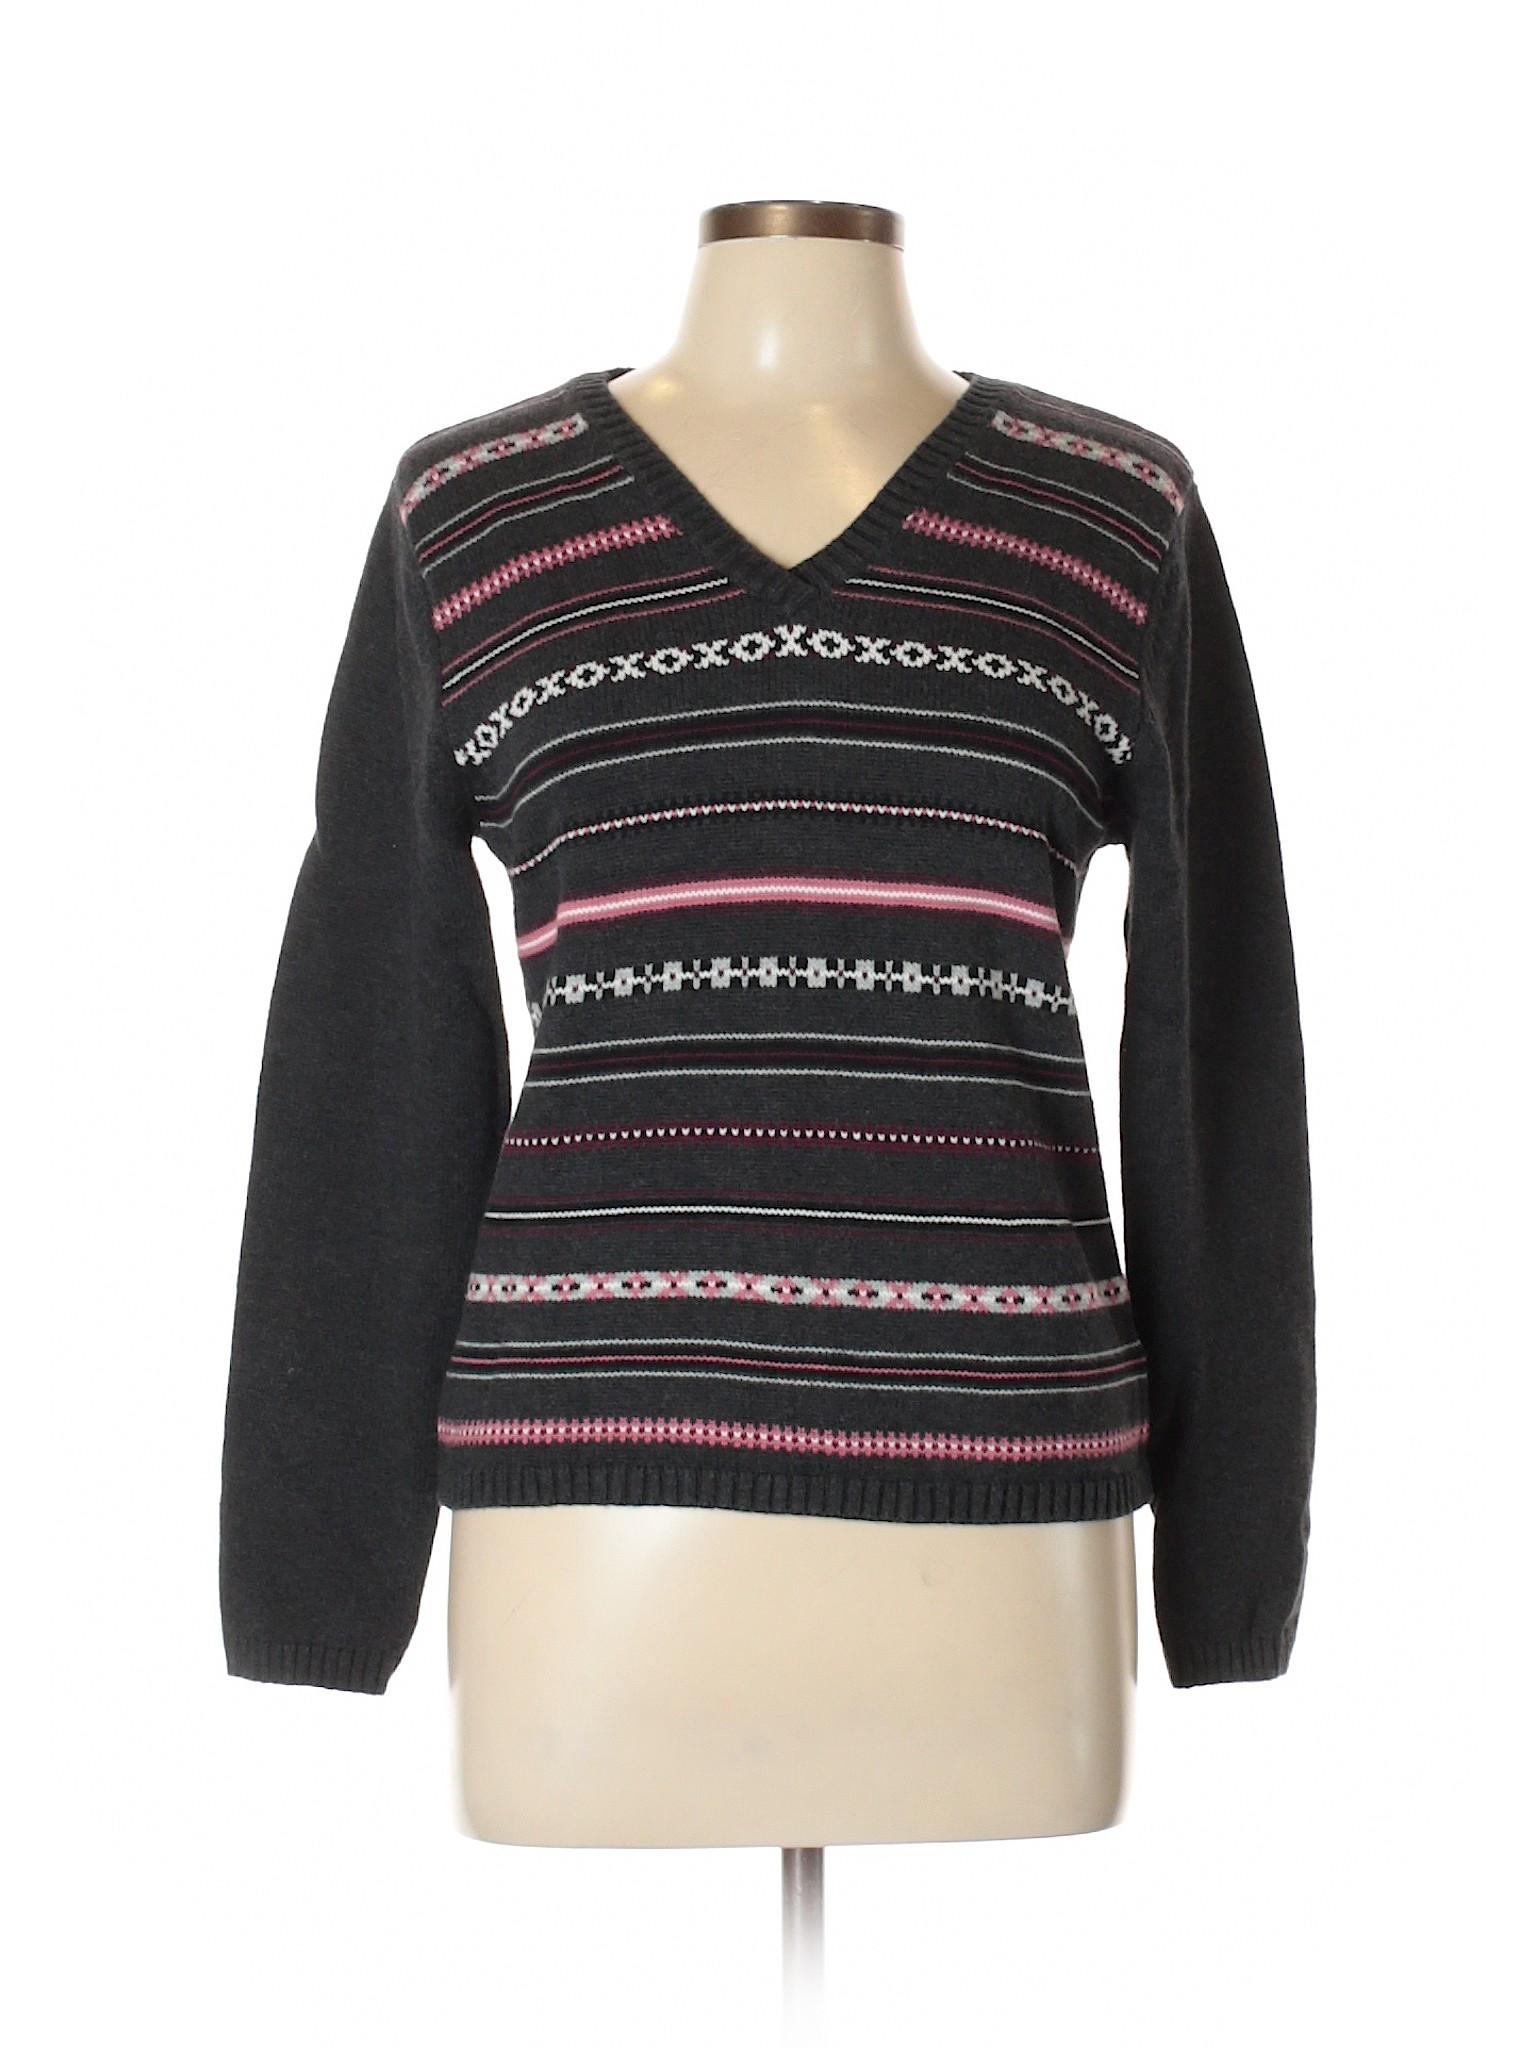 winter IZOD Sweater winter IZOD Boutique Boutique winter Boutique Sweater Sweater Pullover Pullover Boutique IZOD Pullover w0S4AnPxqS